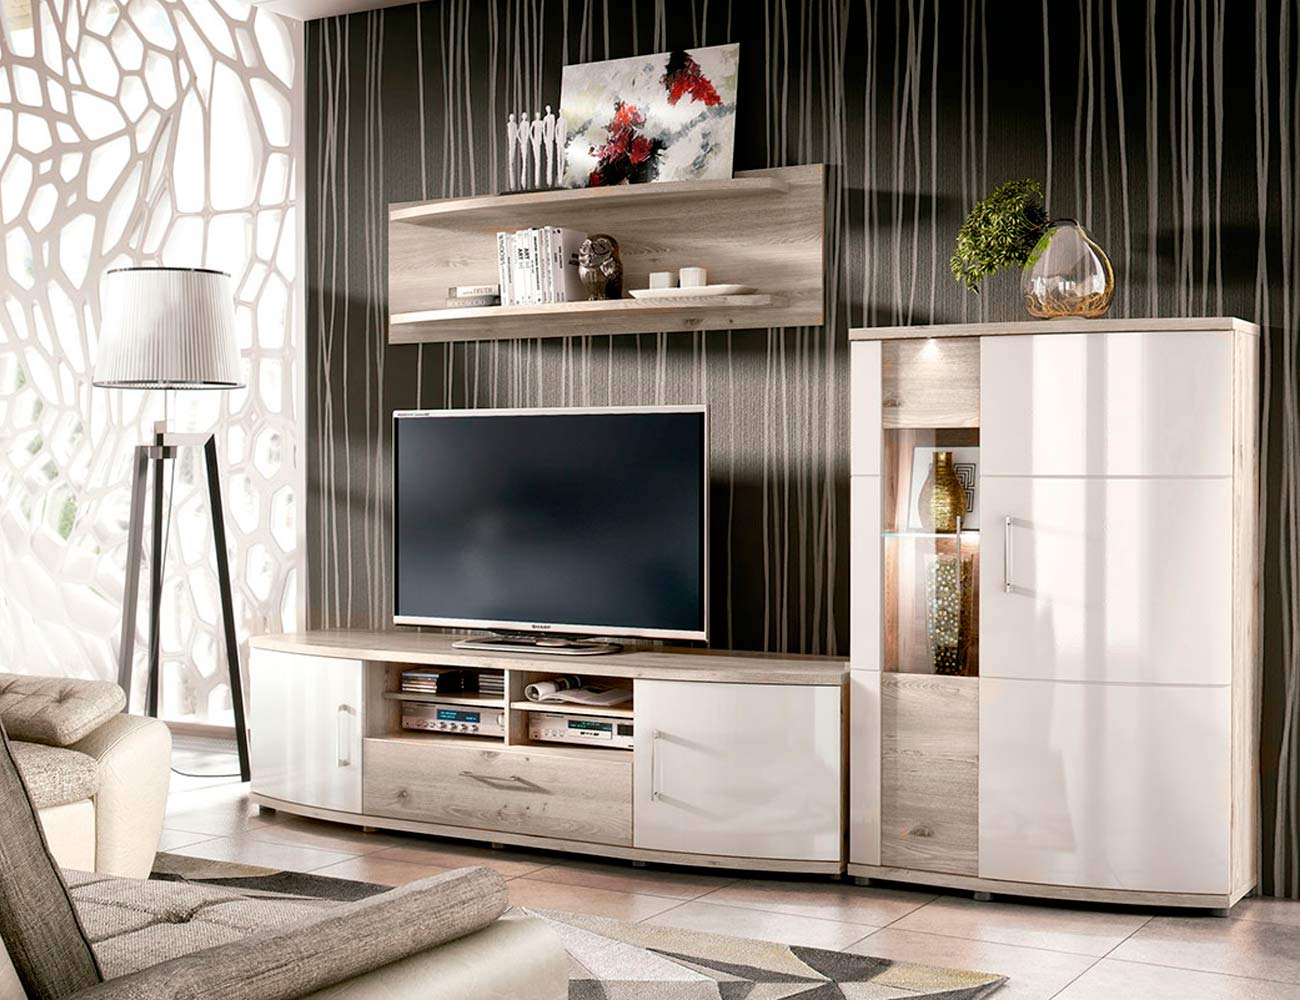 Mueble salon comedor vitrina bodeguero bajo tv nelson blanco